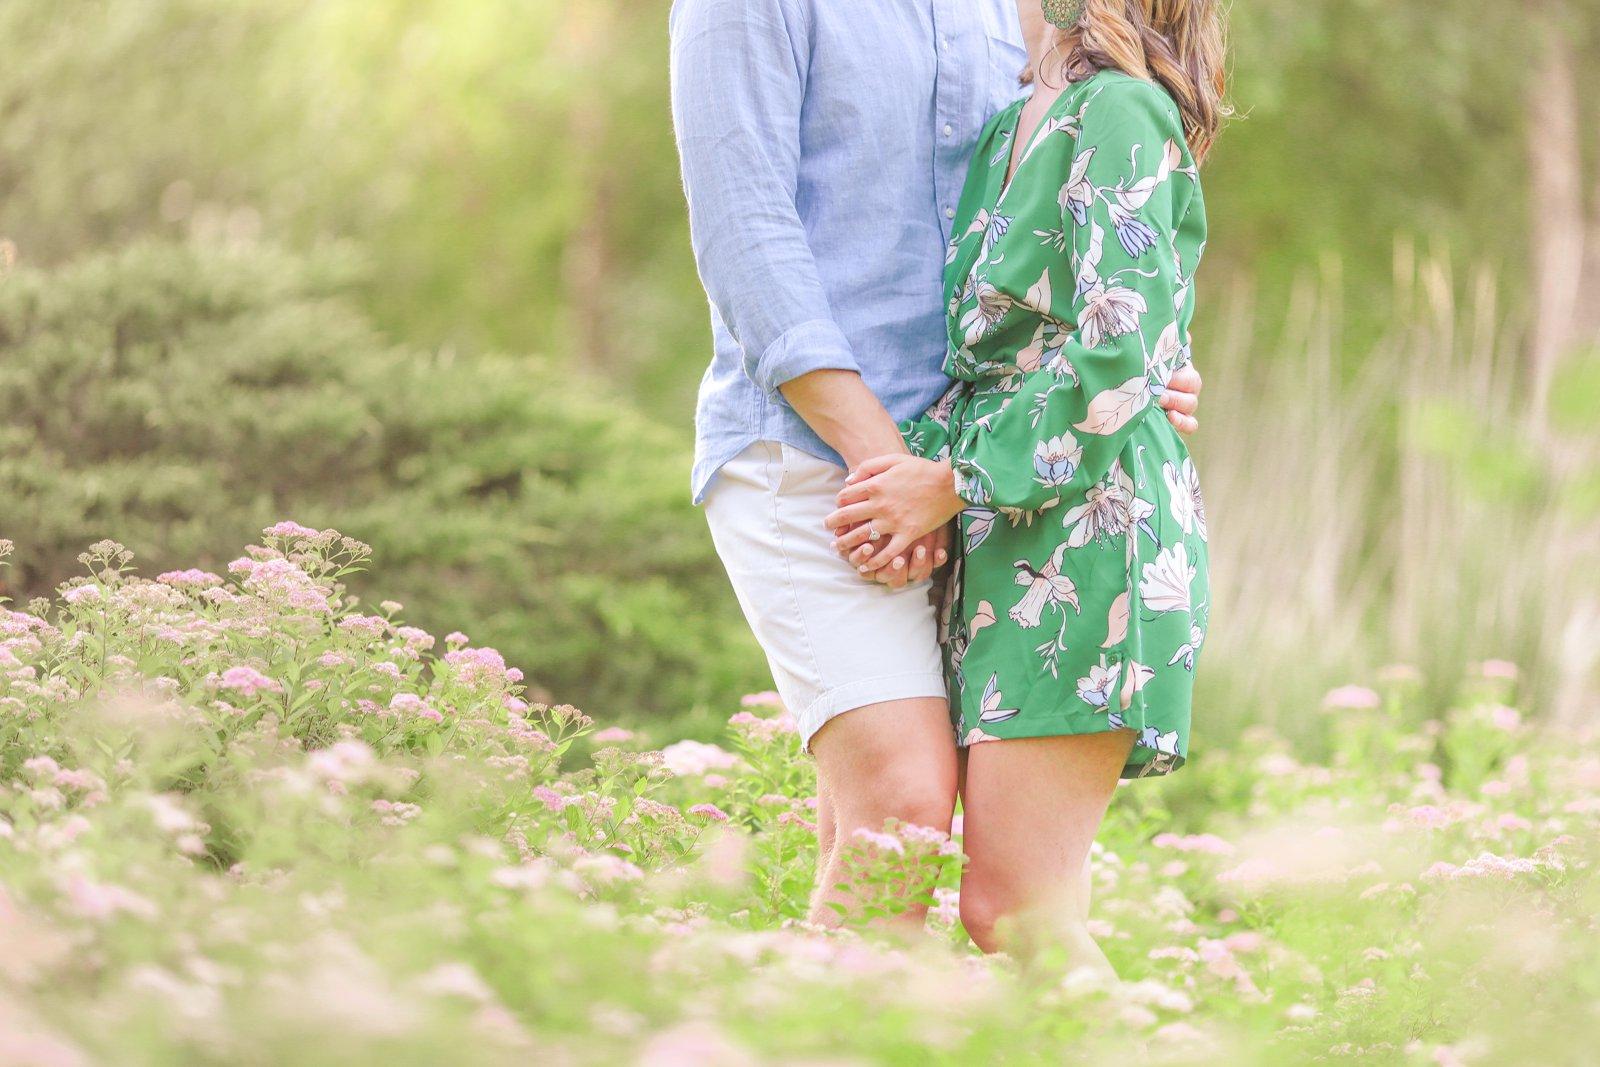 wedding_photographer_Missouri_Destination_elope_intimate_Saint_James_MO_Missouri_KansasCity_Jeff_City_Jefferson_Columbia_Engagement_Photos_Pictures_Session_Best_Videographer_0386.jpg